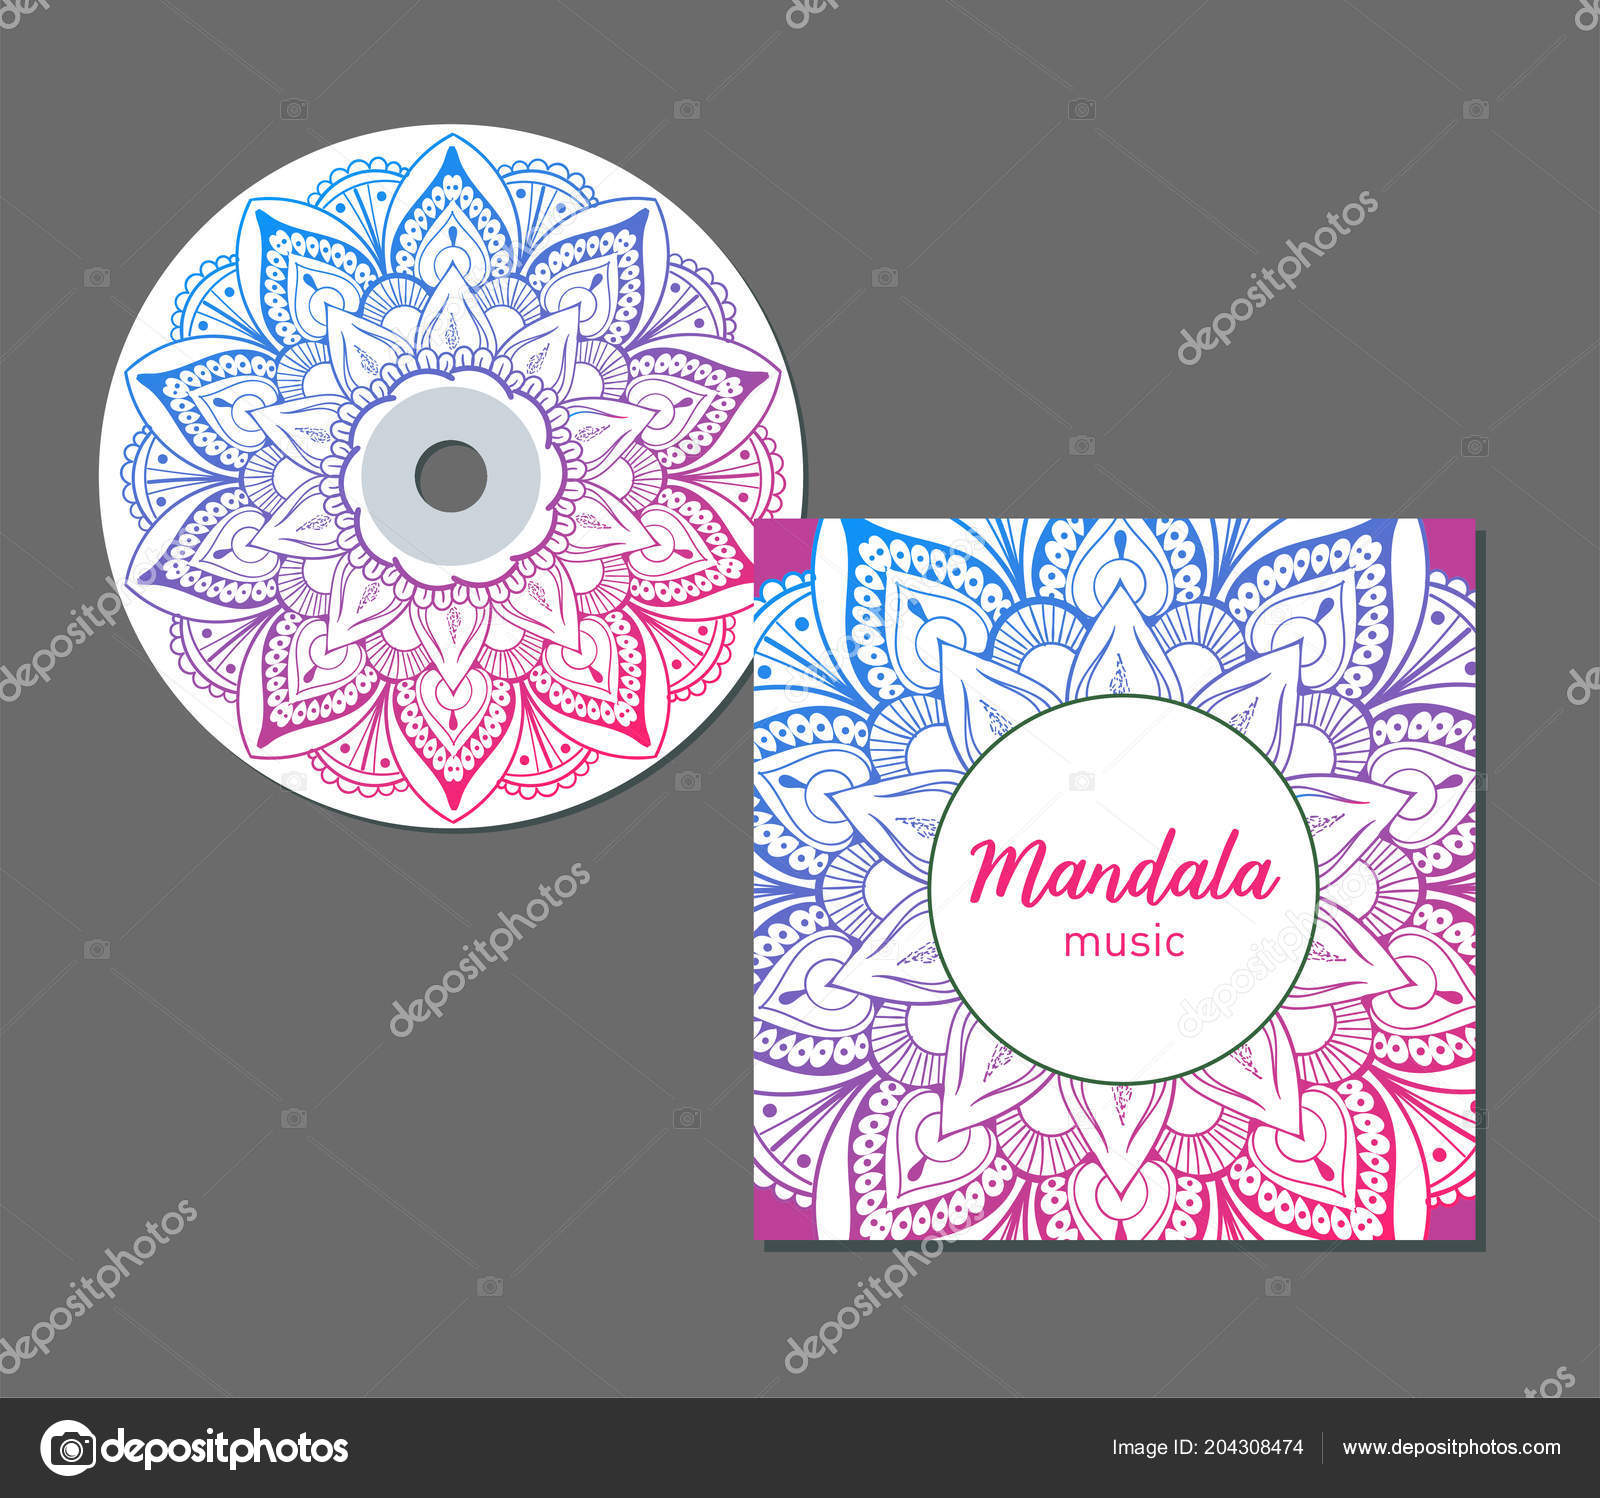 Cd Cover Design Template With Floral Mandala Style Arabic Indian Pakistan Asian Motif Vector Illustration Stock Vector C Mariaaverburg 204308474,Japanese Leg Sleeve Tattoo Designs